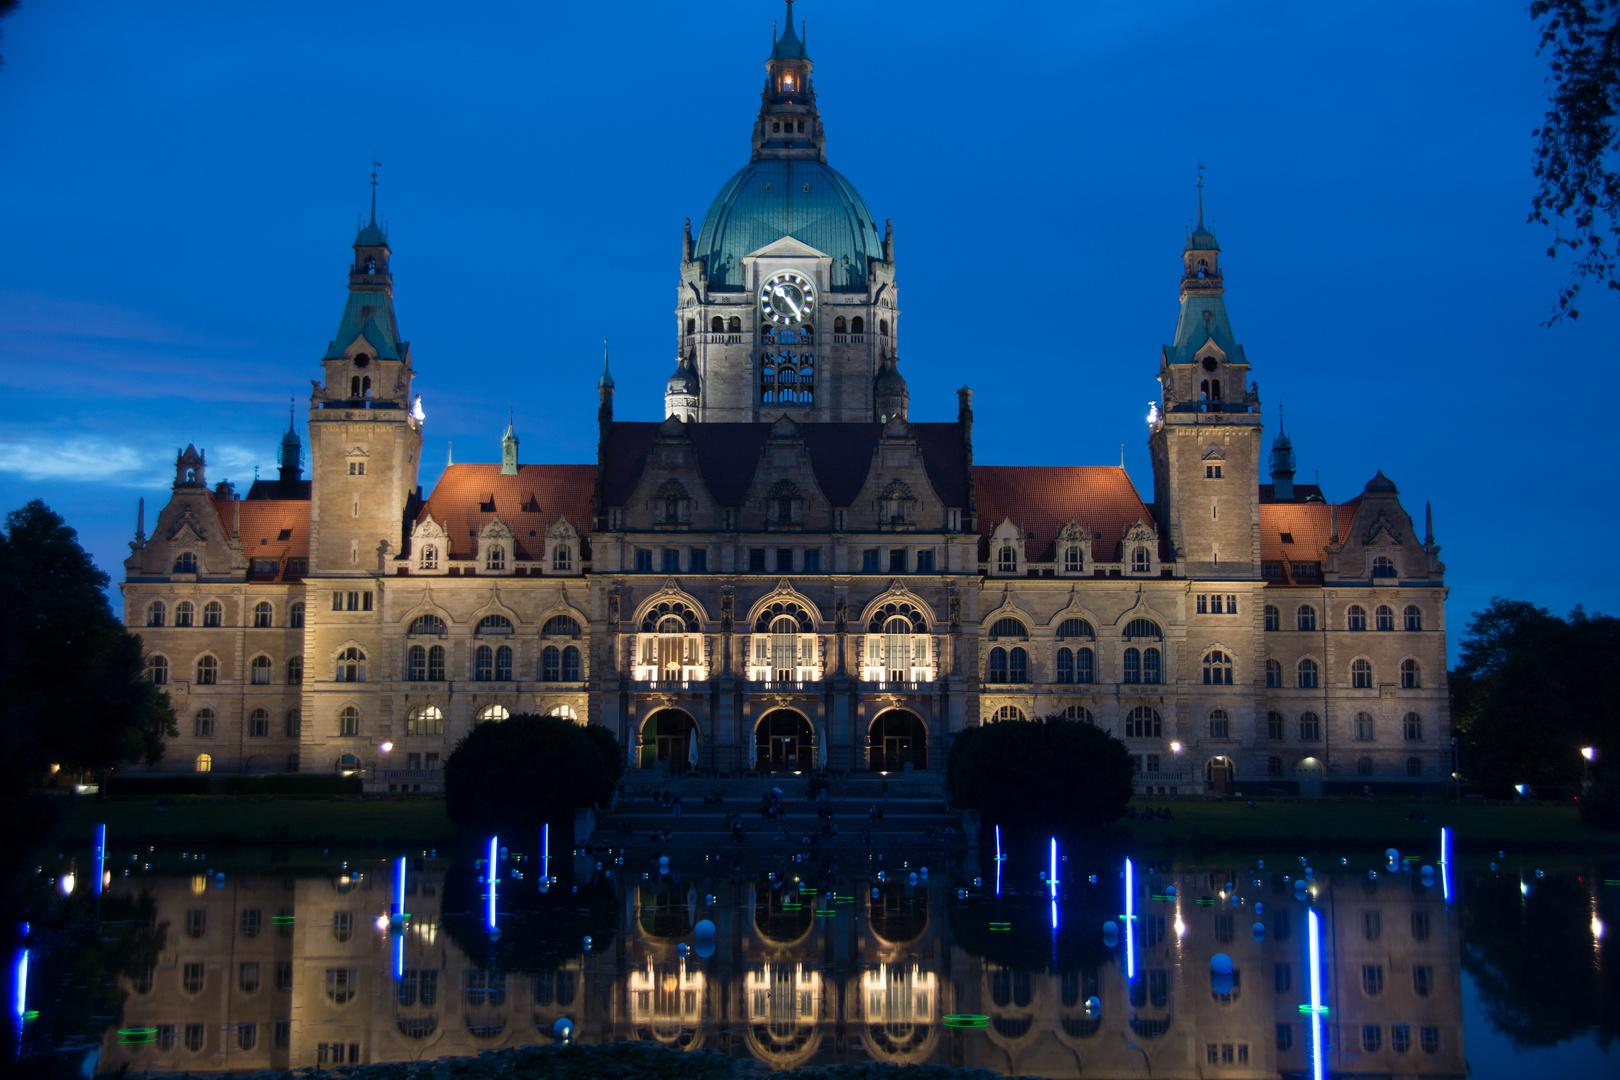 Neues Rathaus in Hannover bei Nacht